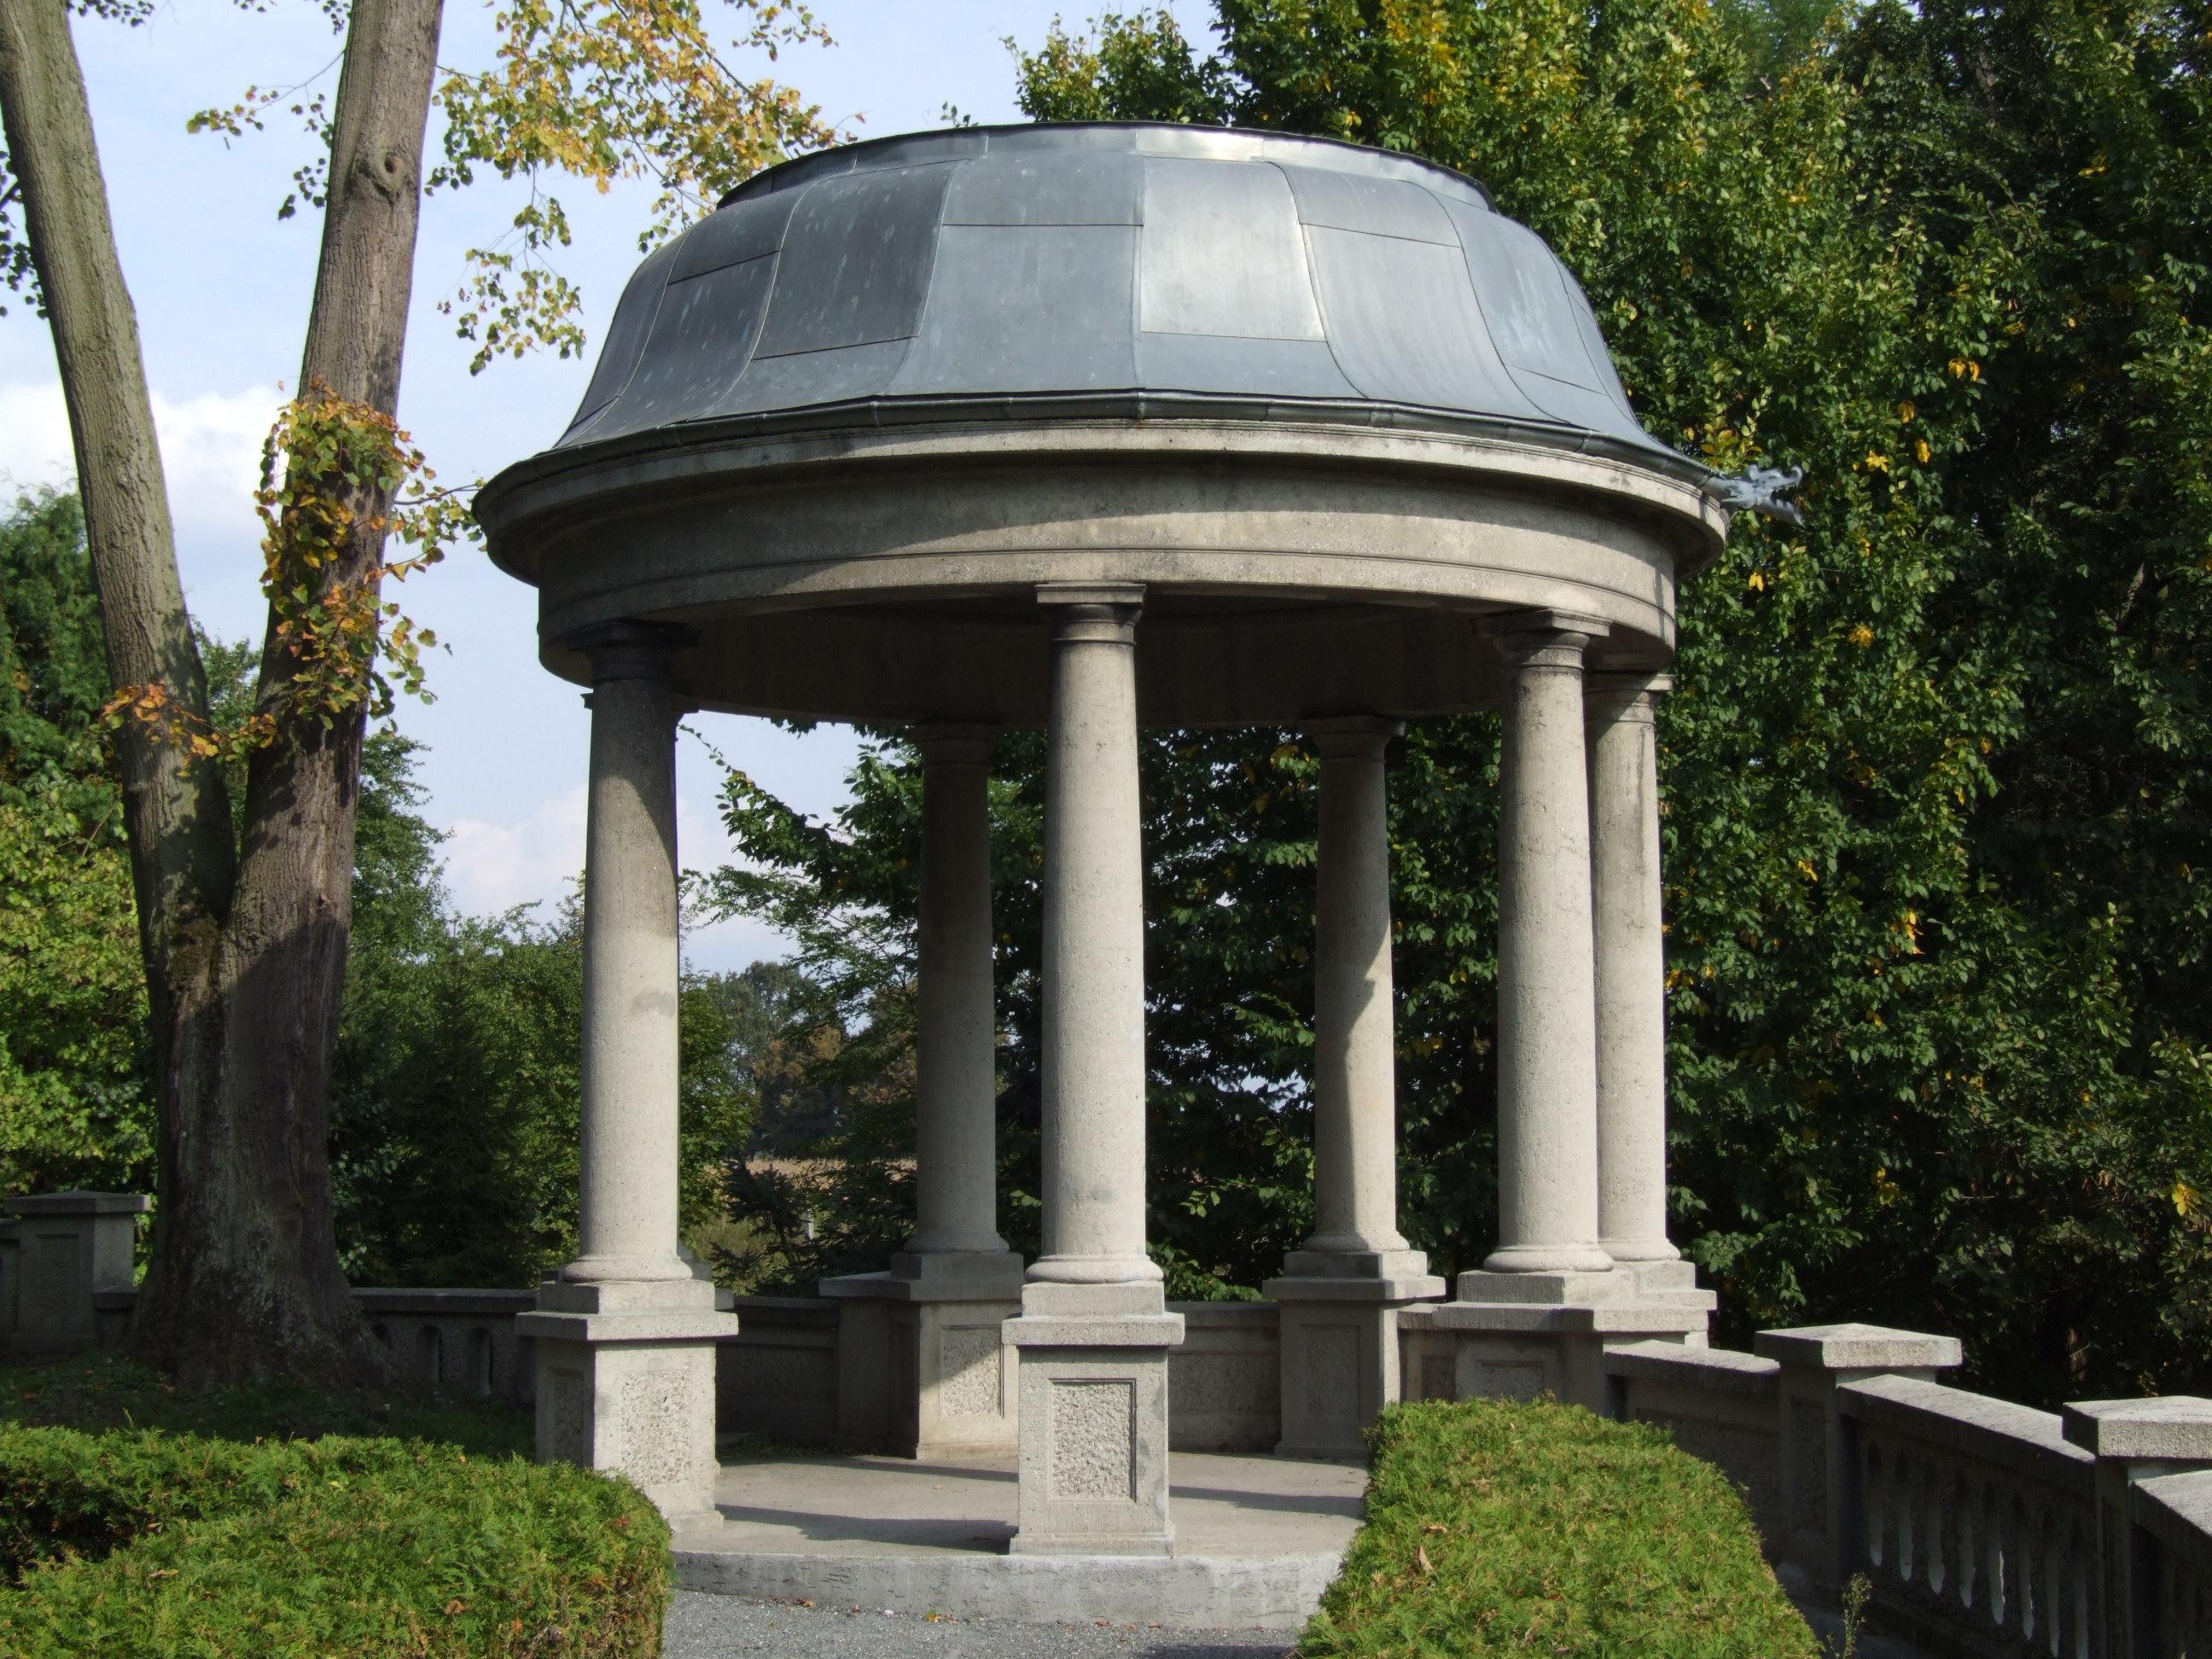 Pavillon Garten Pic : File garden pavilion in rogau g wikimedia commons